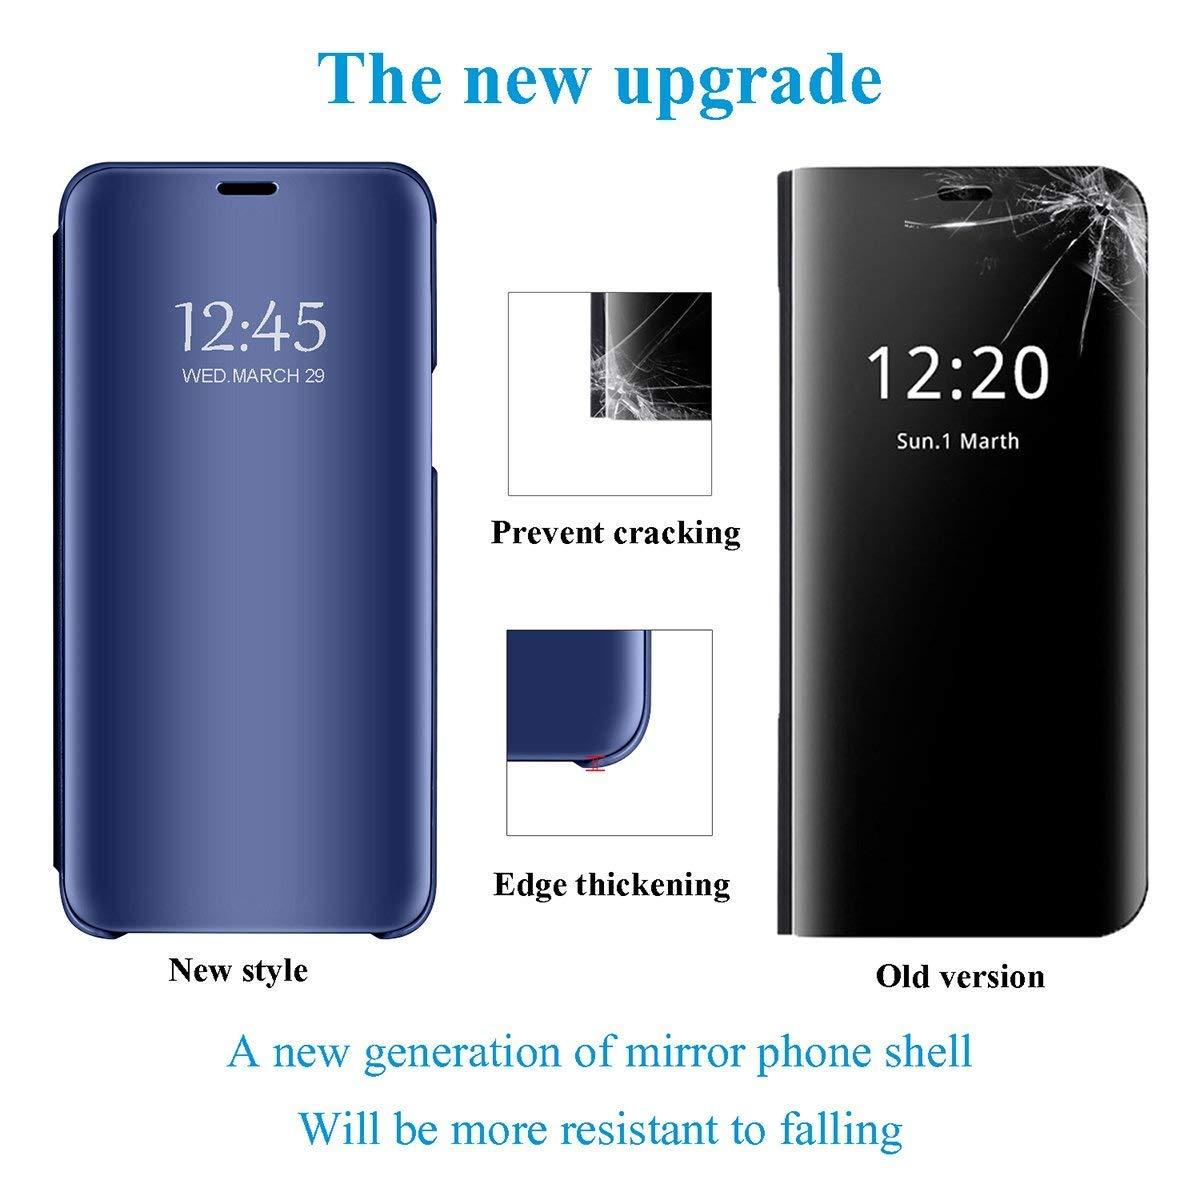 Caler Coque Xiaomi Redmi 6//6/A /Étui Miroir Portefeuille Case Flip Silicone Transparent Wallet en Cuir Bumper Folio de Protection Couverture Mirror Support Shell